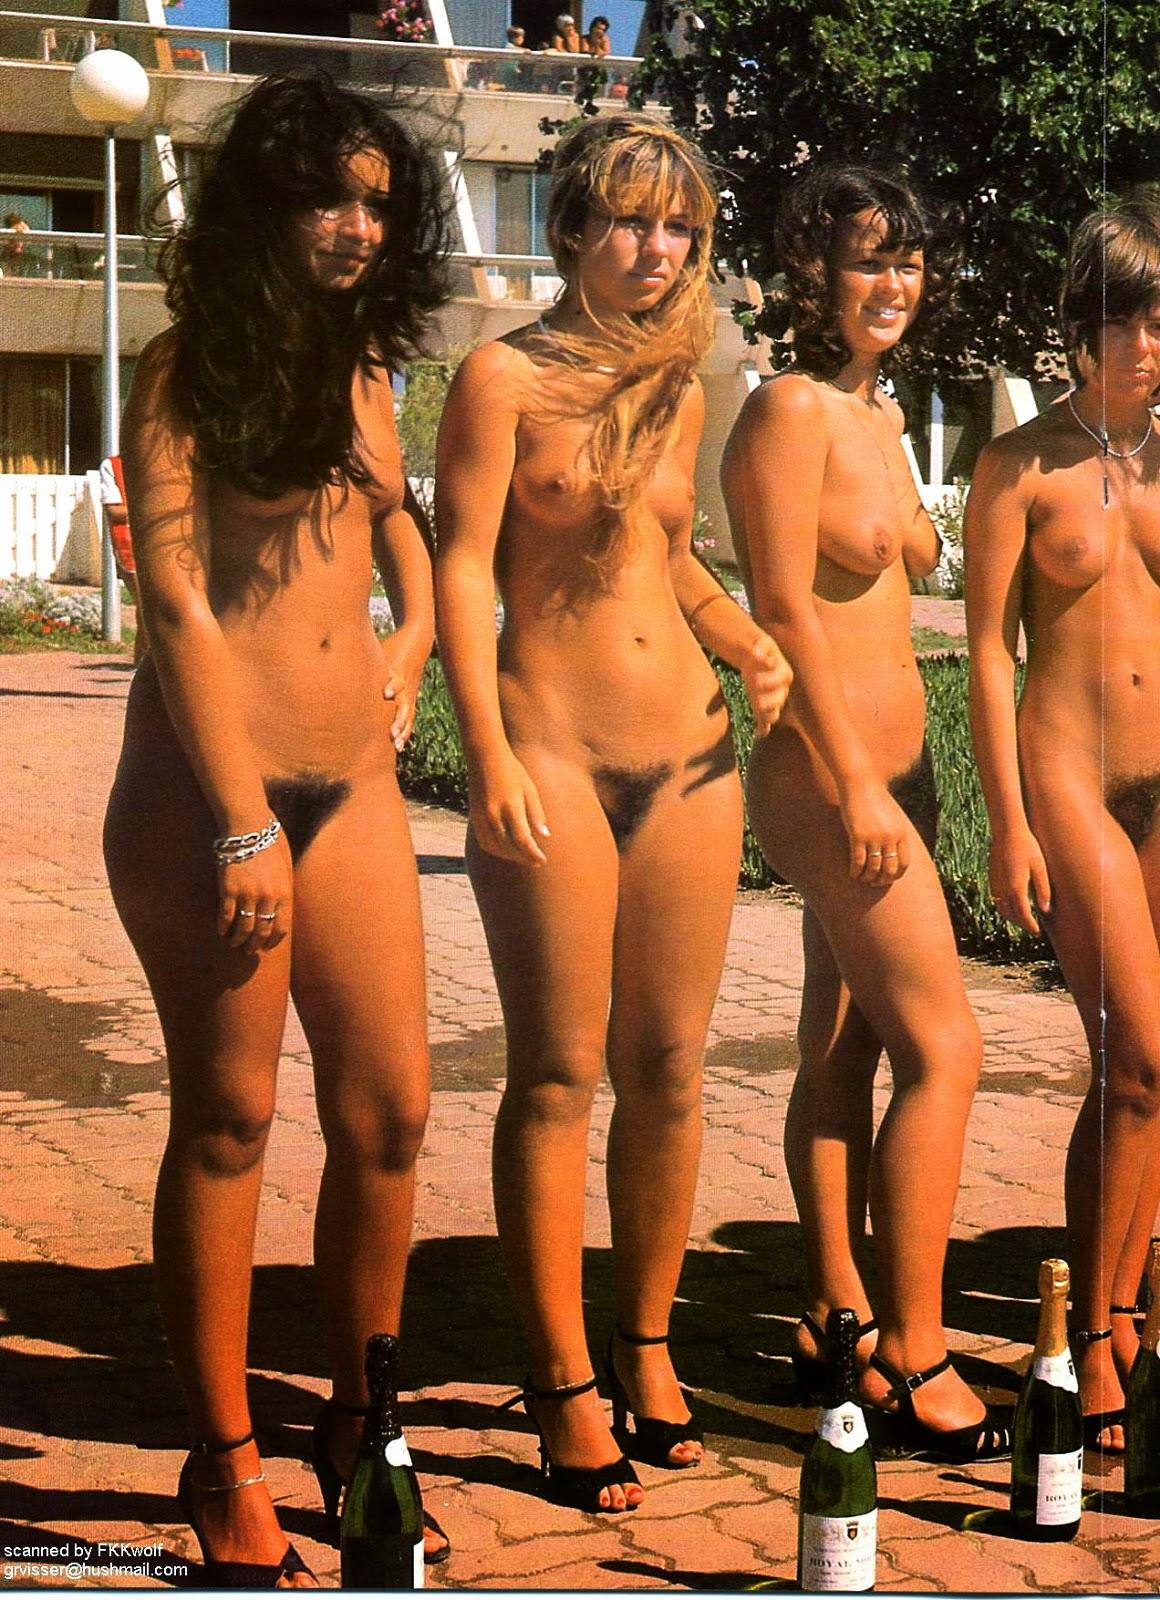 from Ibrahim sonnenfreunde sonderheft nude girl